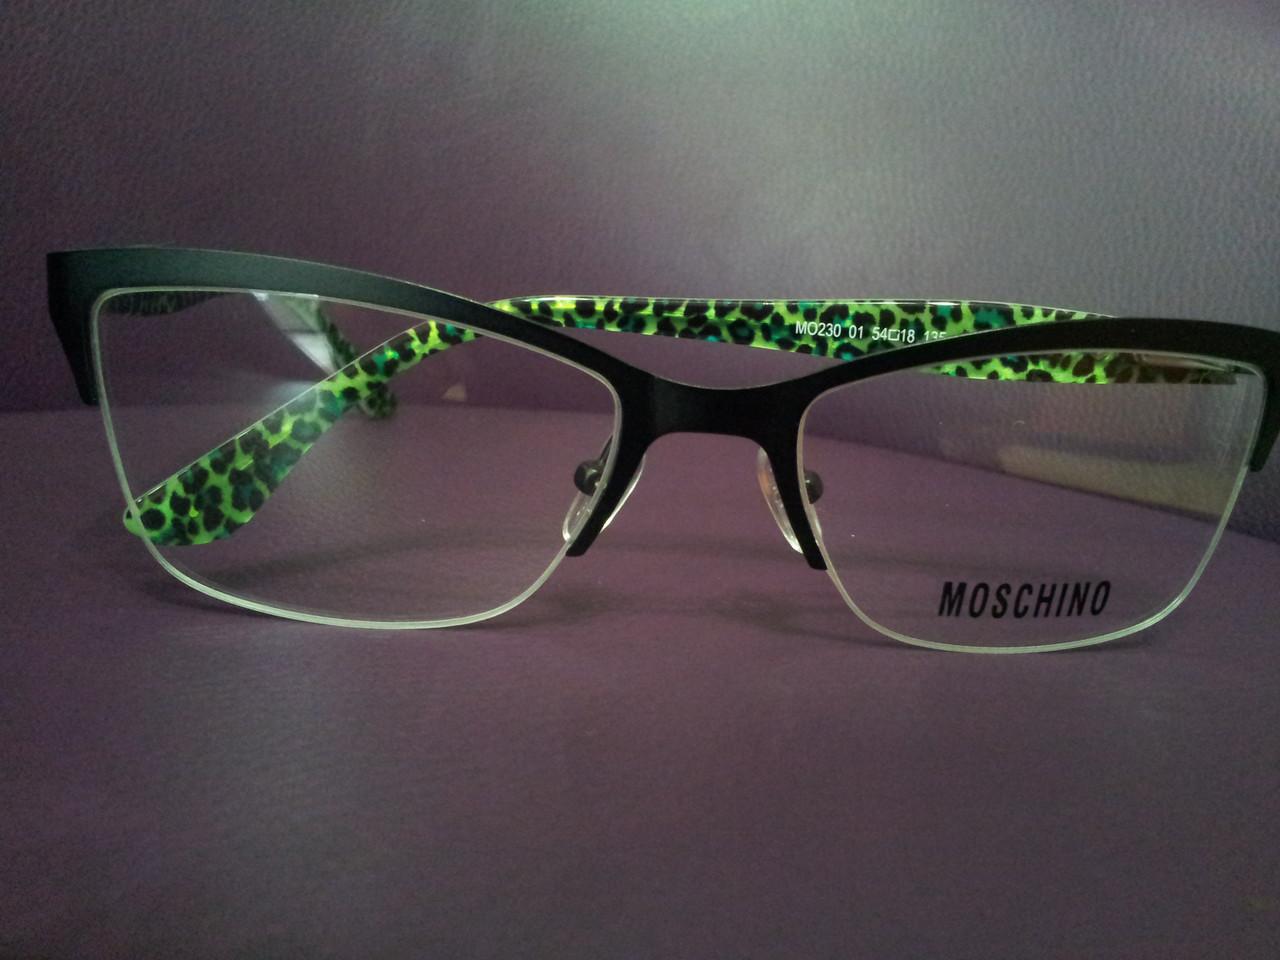 Оправы Moschino - фото 2